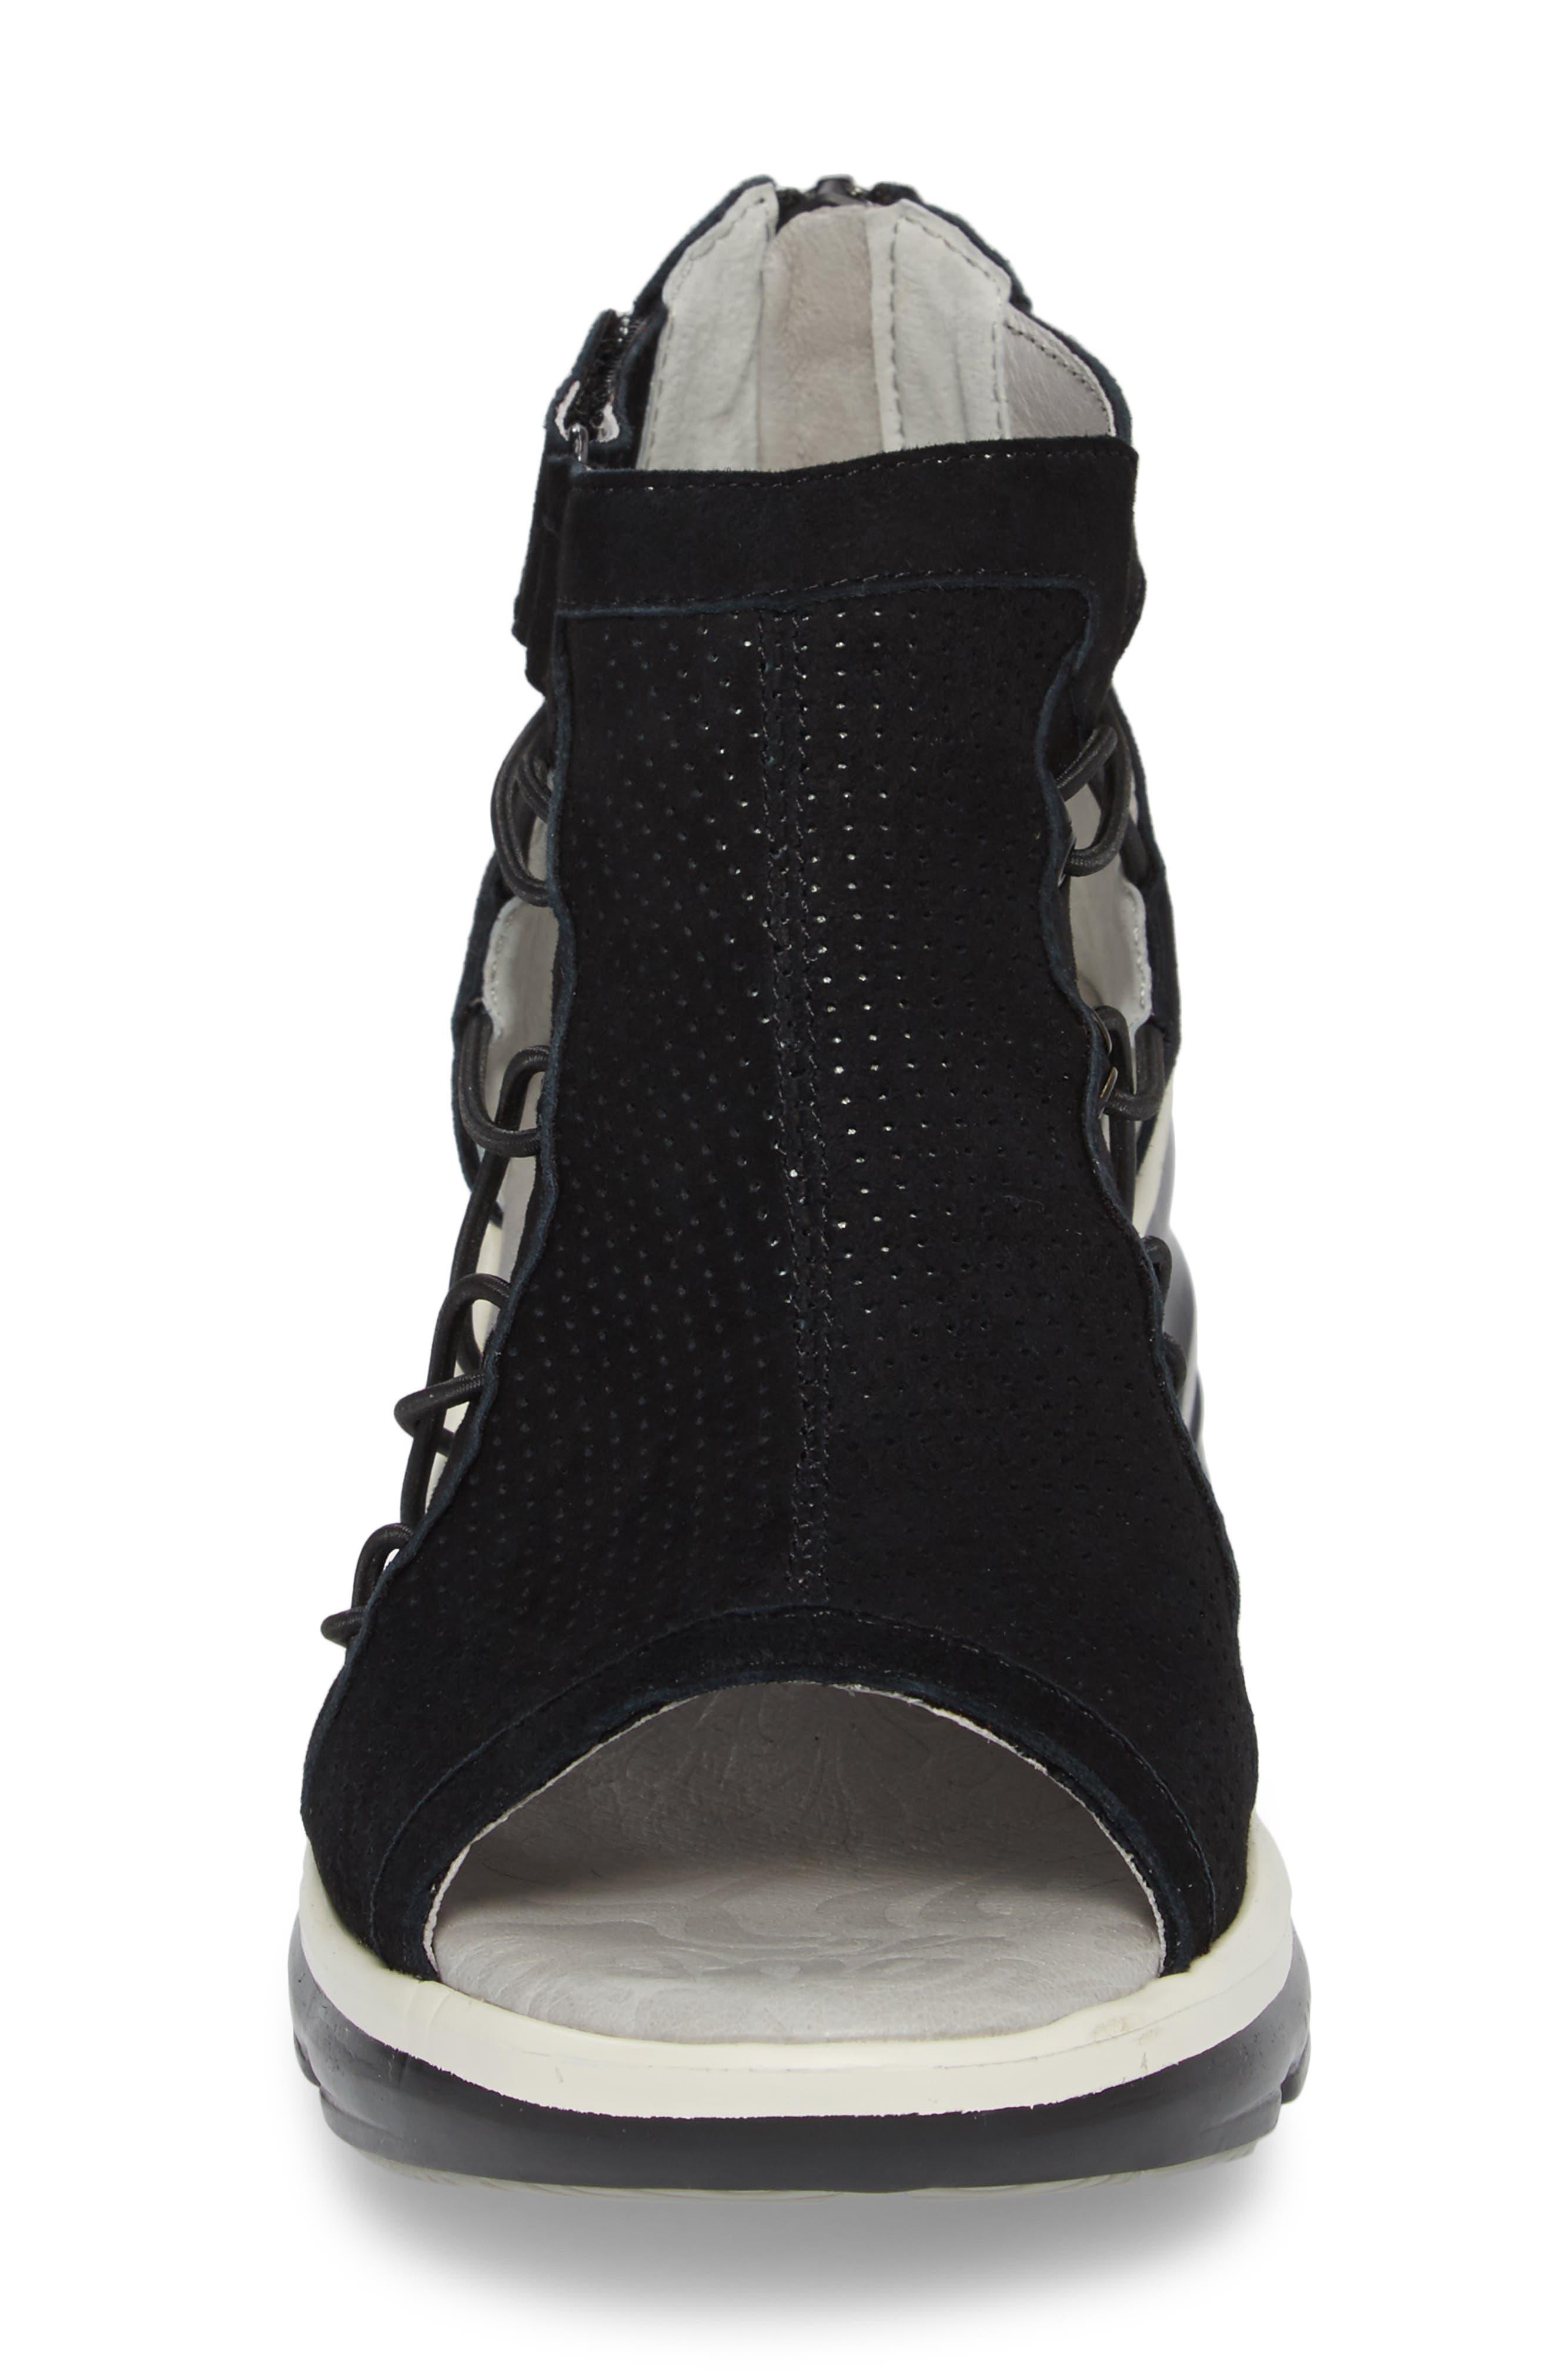 JAMBU, Naomi Perforated Wedge Sandal, Alternate thumbnail 4, color, BLACK SUEDE